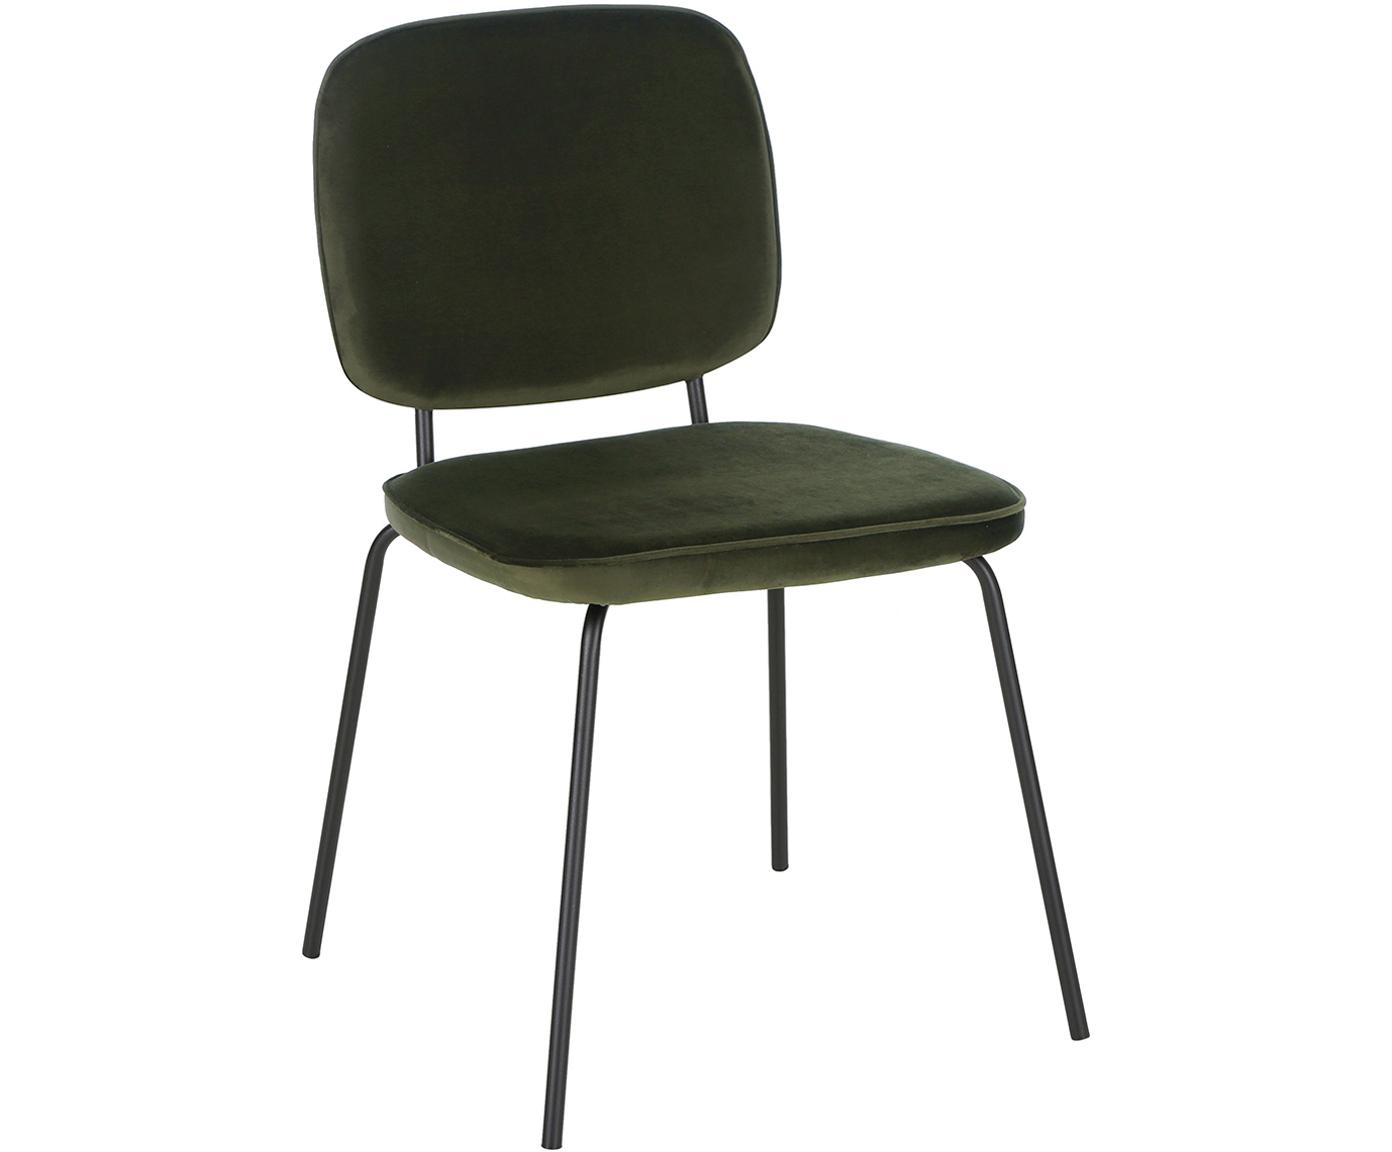 Sedia imbottita in velluto Jasper 2 pz, Rivestimento: velluto (copertura in pol, Gambe: metallo verniciato a polv, Verde scuro, Larg. 49 x Prof. 57 cm